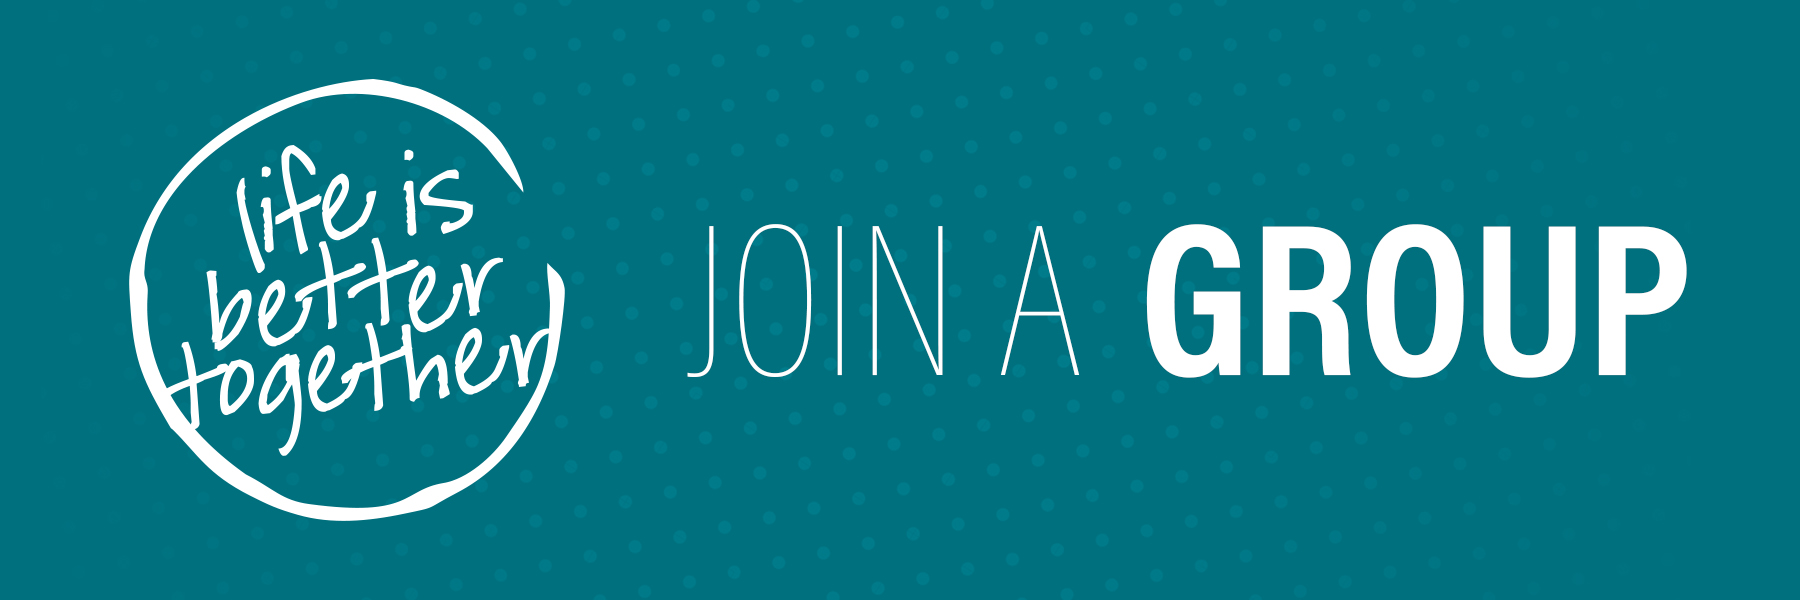 Join a Group web header.jpg